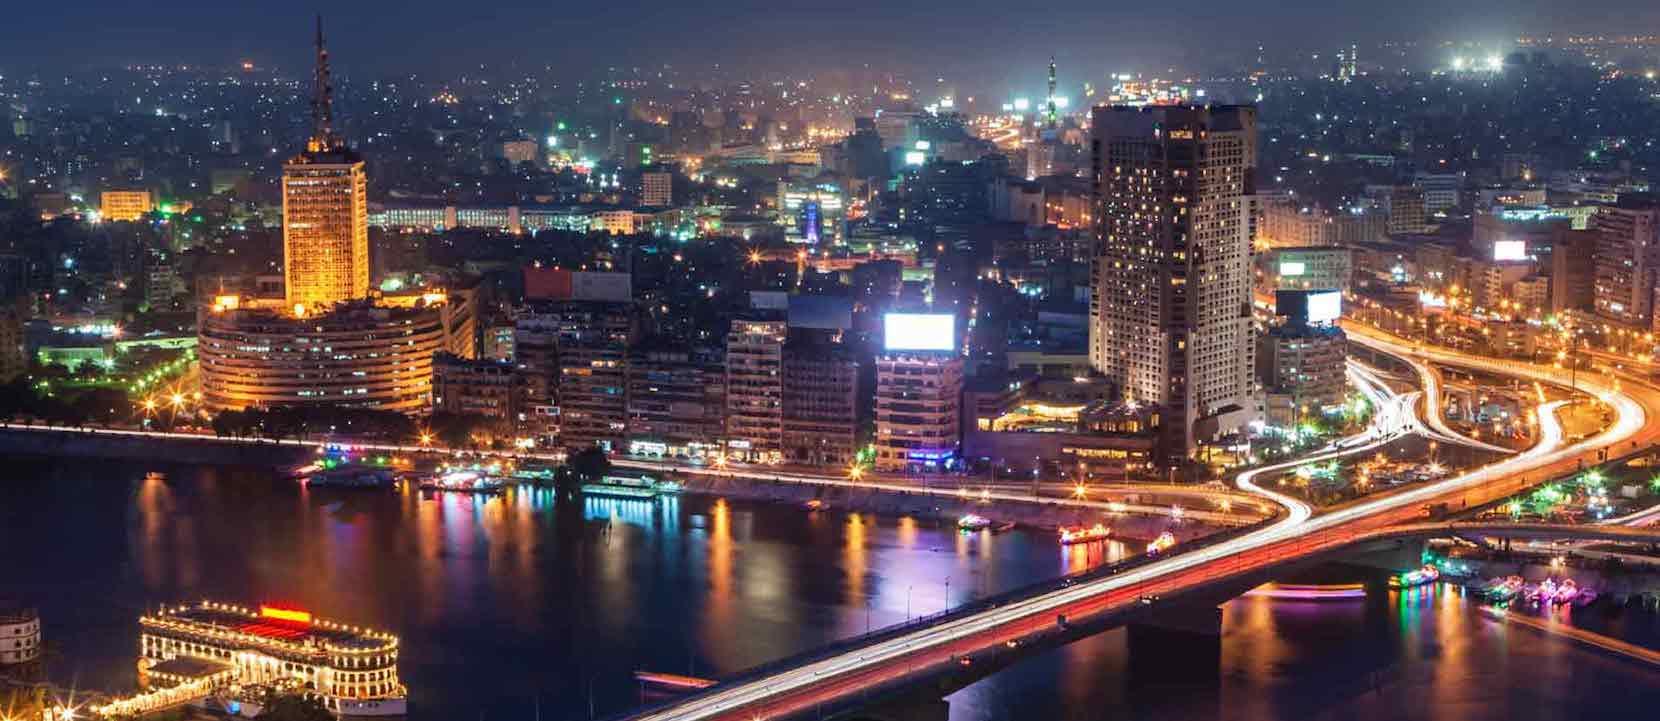 10 Day Grand tour of Egypt , Cairo 3N , Cruise 3N , Hurghada 3N / Premium Private tour